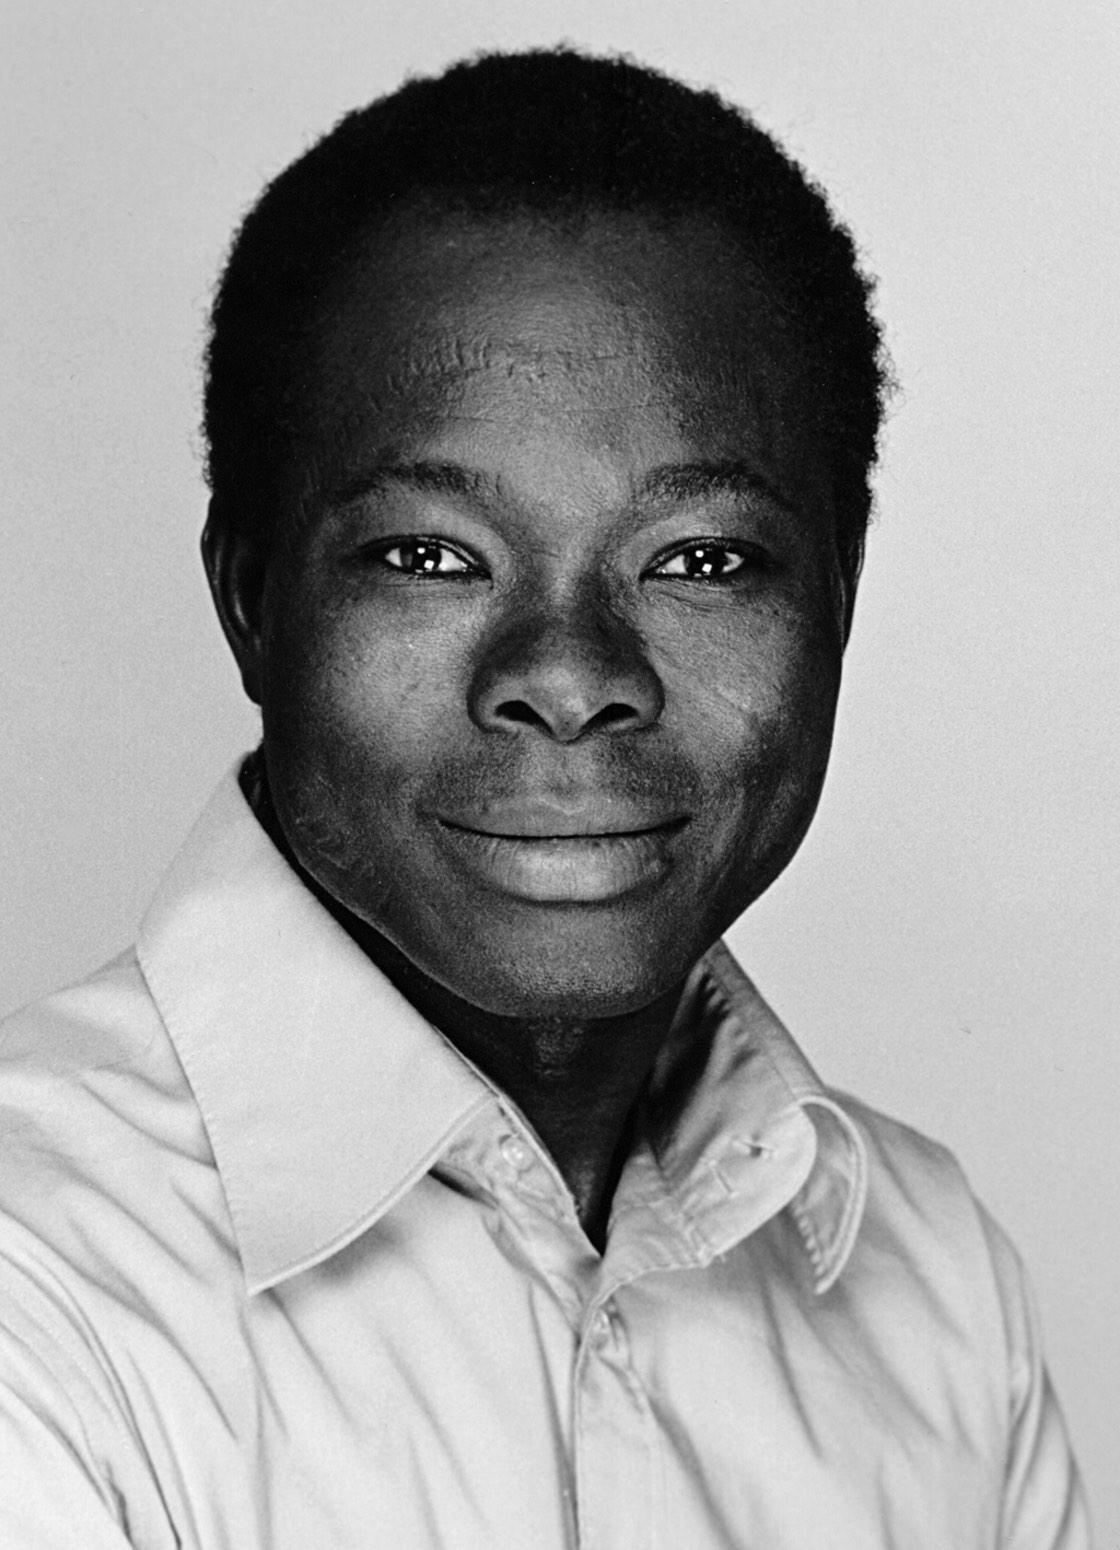 Diébédo Francis Kéré. CC BY-SA 3.0